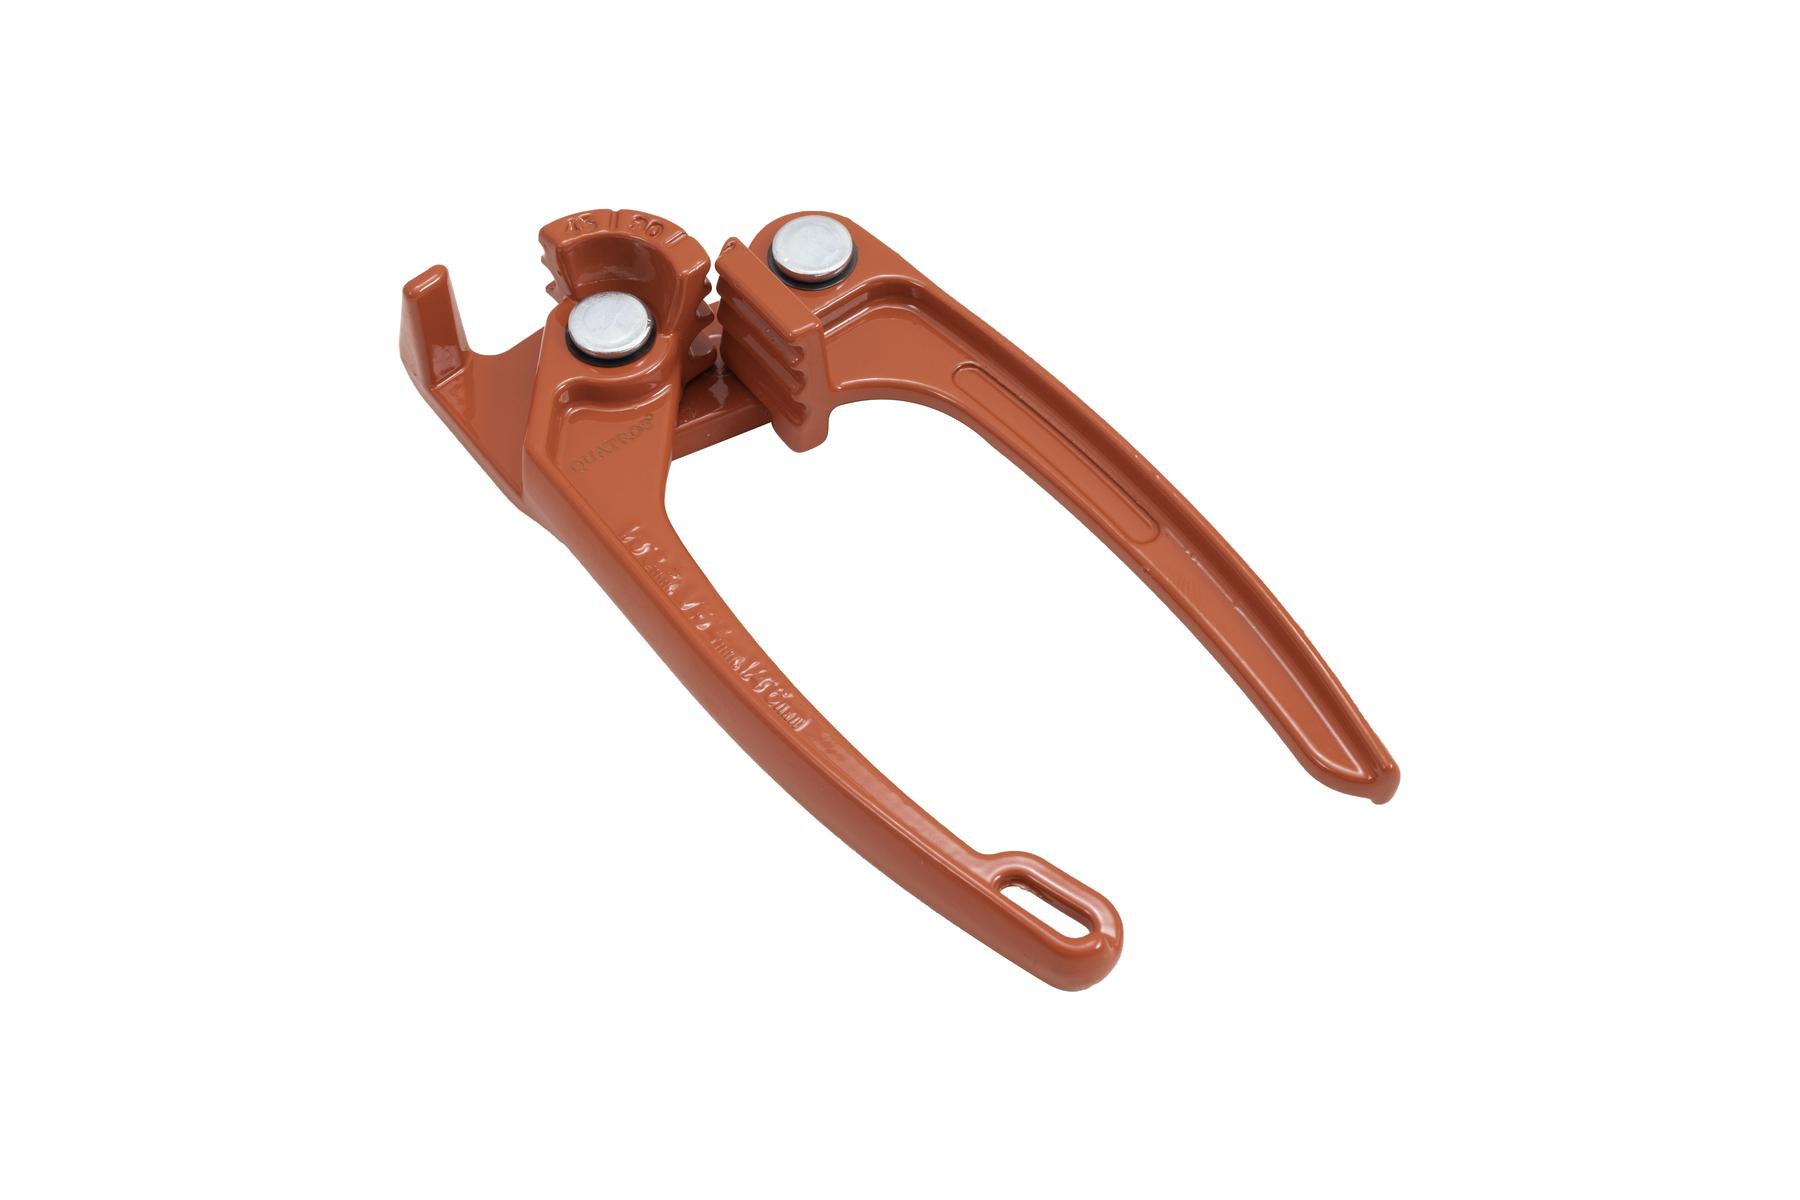 "Ohýbačka brzdových trubek, rozsah 3, 4.75 a 6 mm (1/ ""-1/4)"" - QUATROS QS70114"